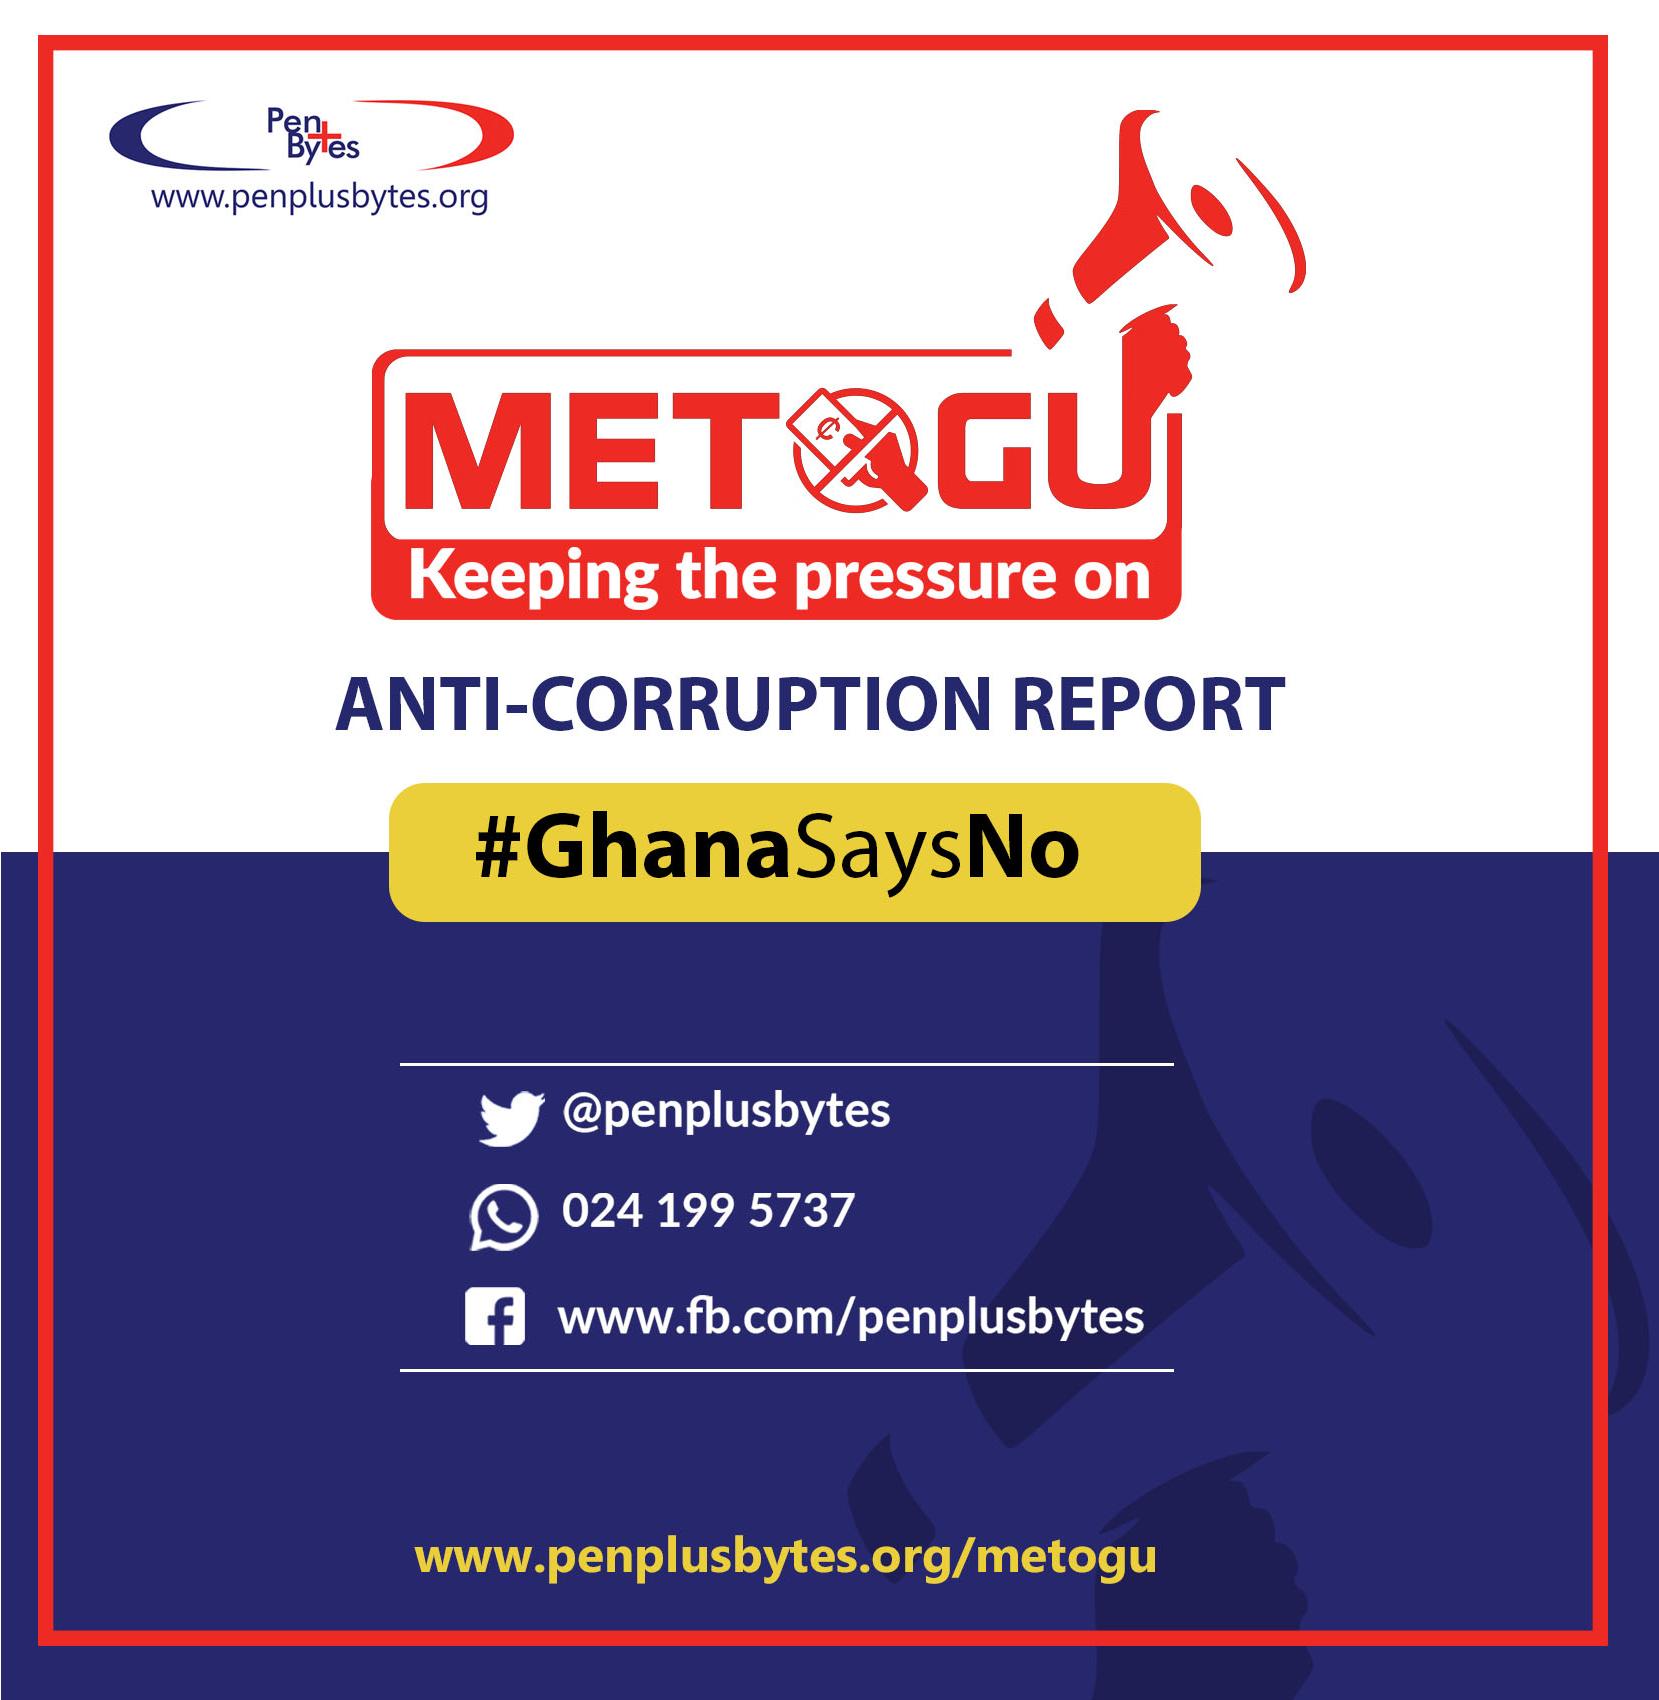 NPP Government to Engage Penplusbytes on METOGU Anti-corruption Report